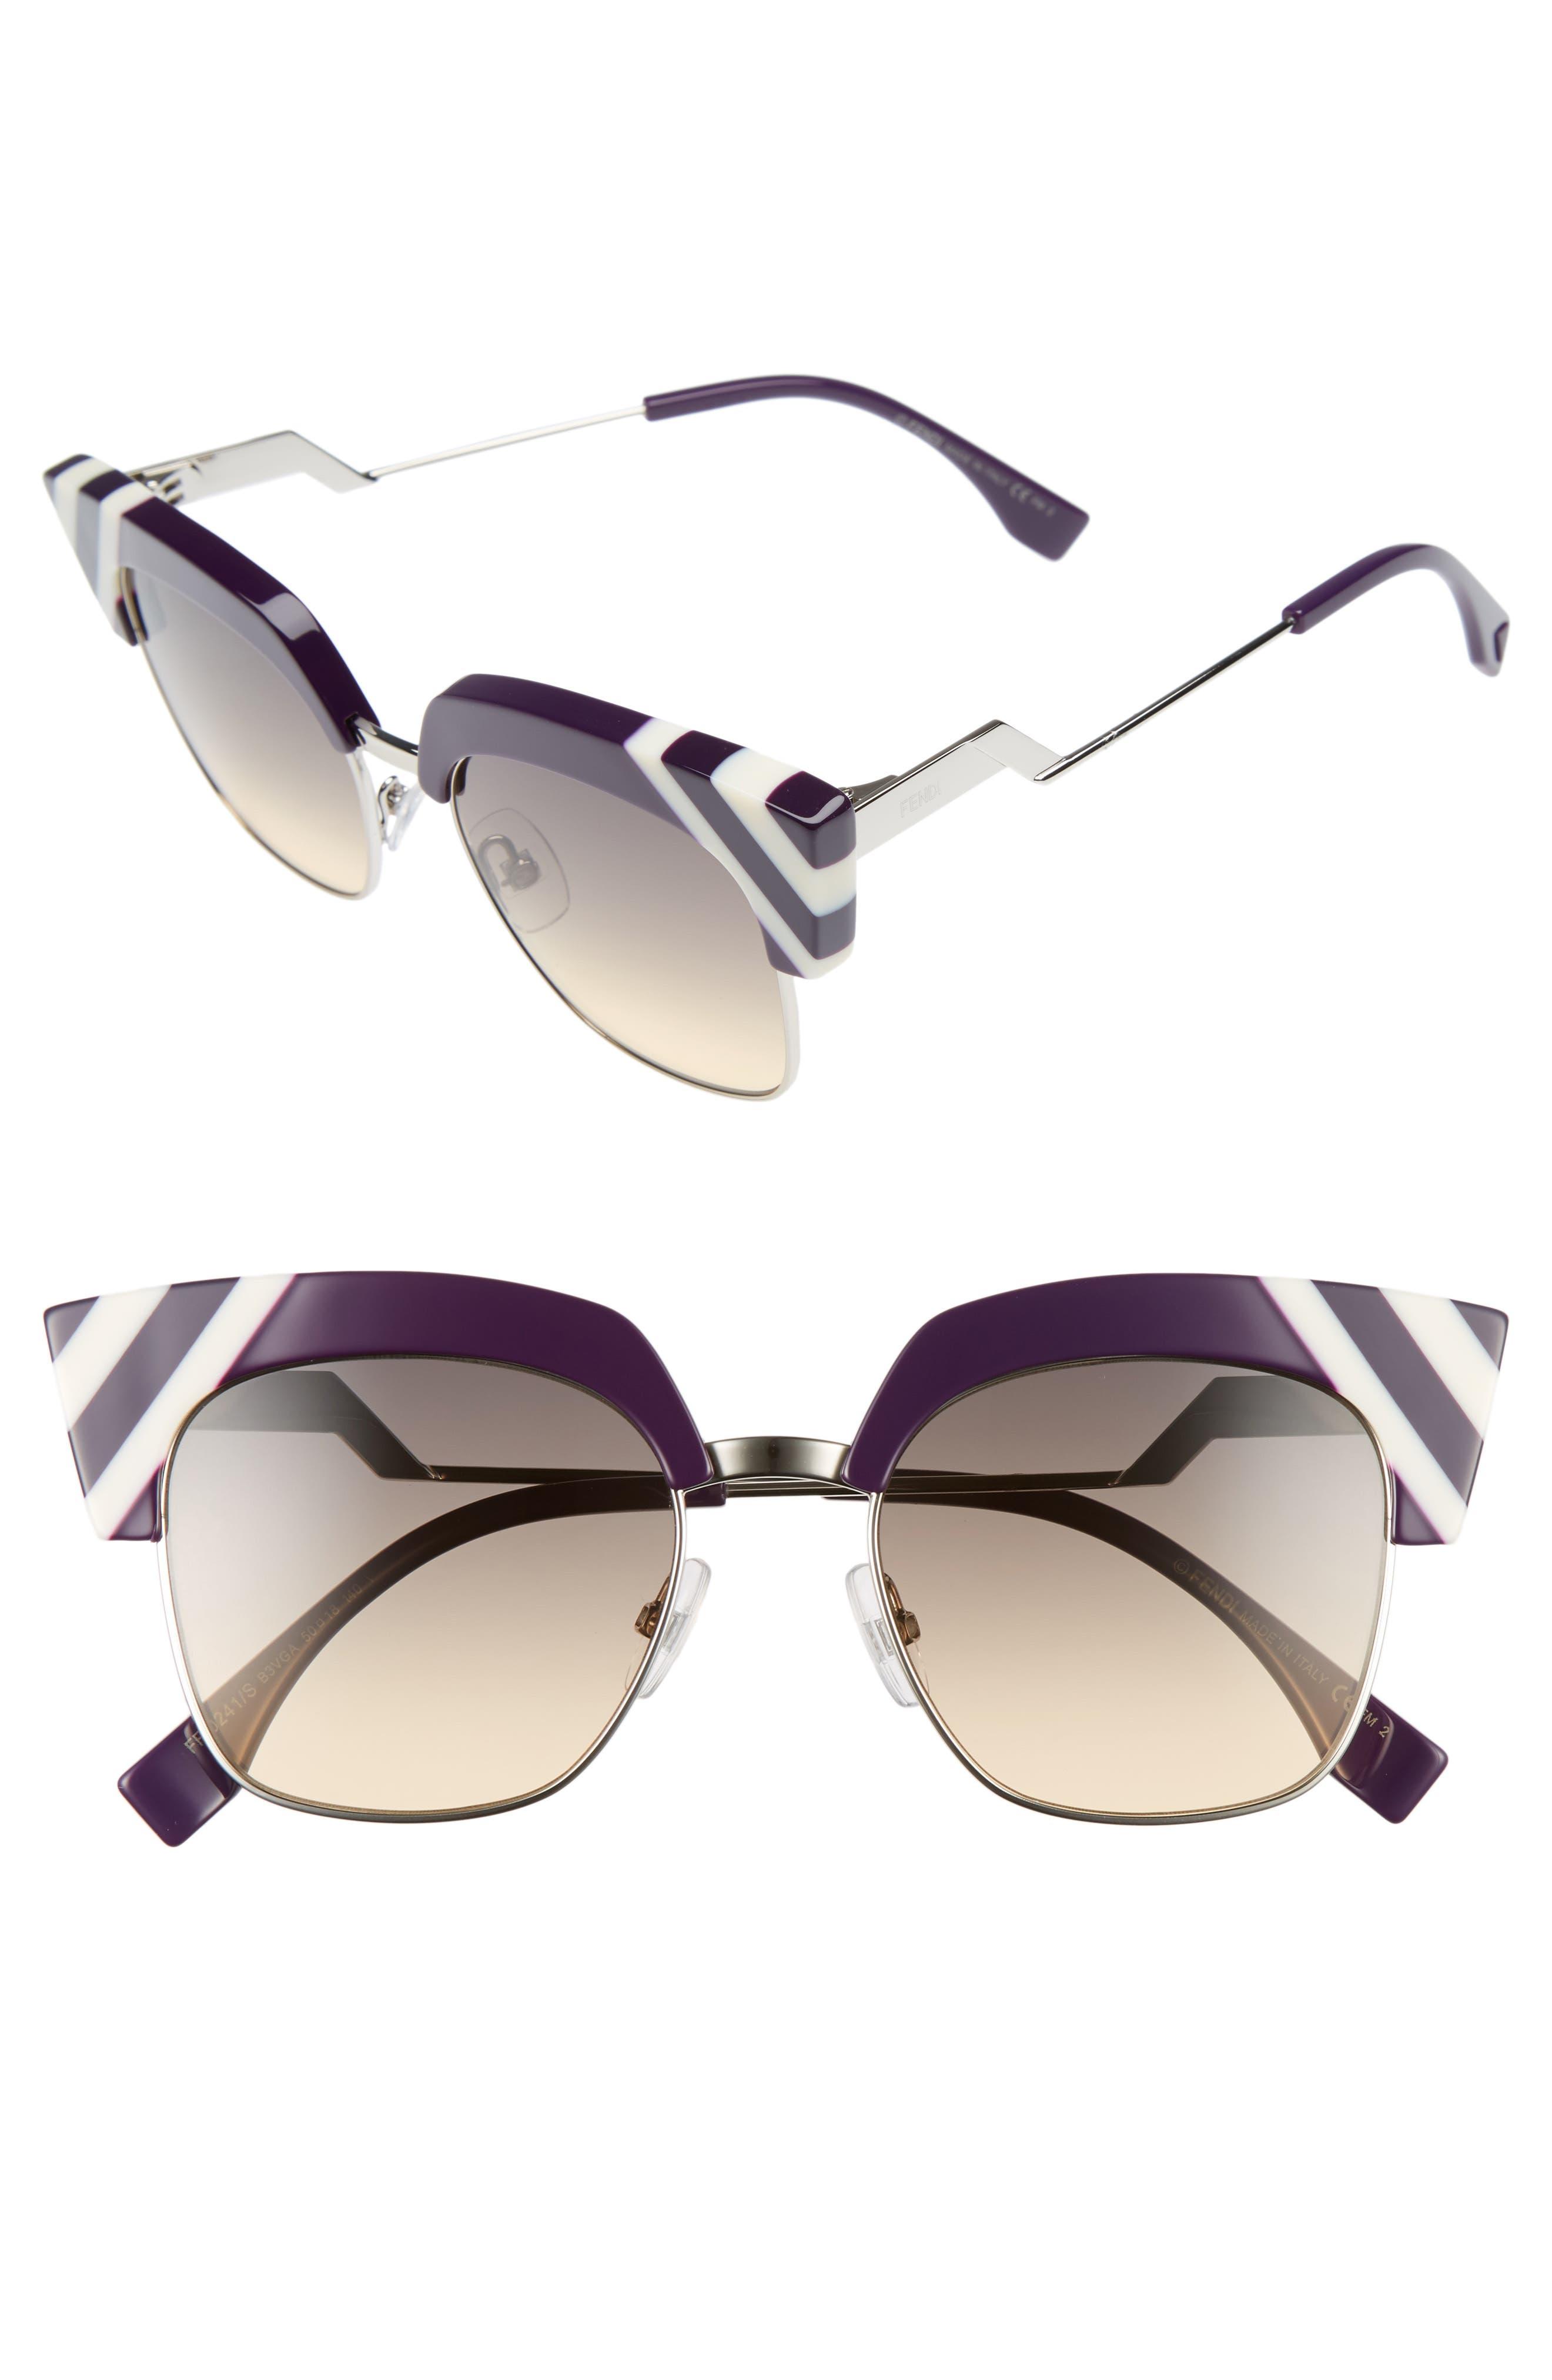 50mm Cat Eye Sunglasses,                             Main thumbnail 1, color,                             Violet